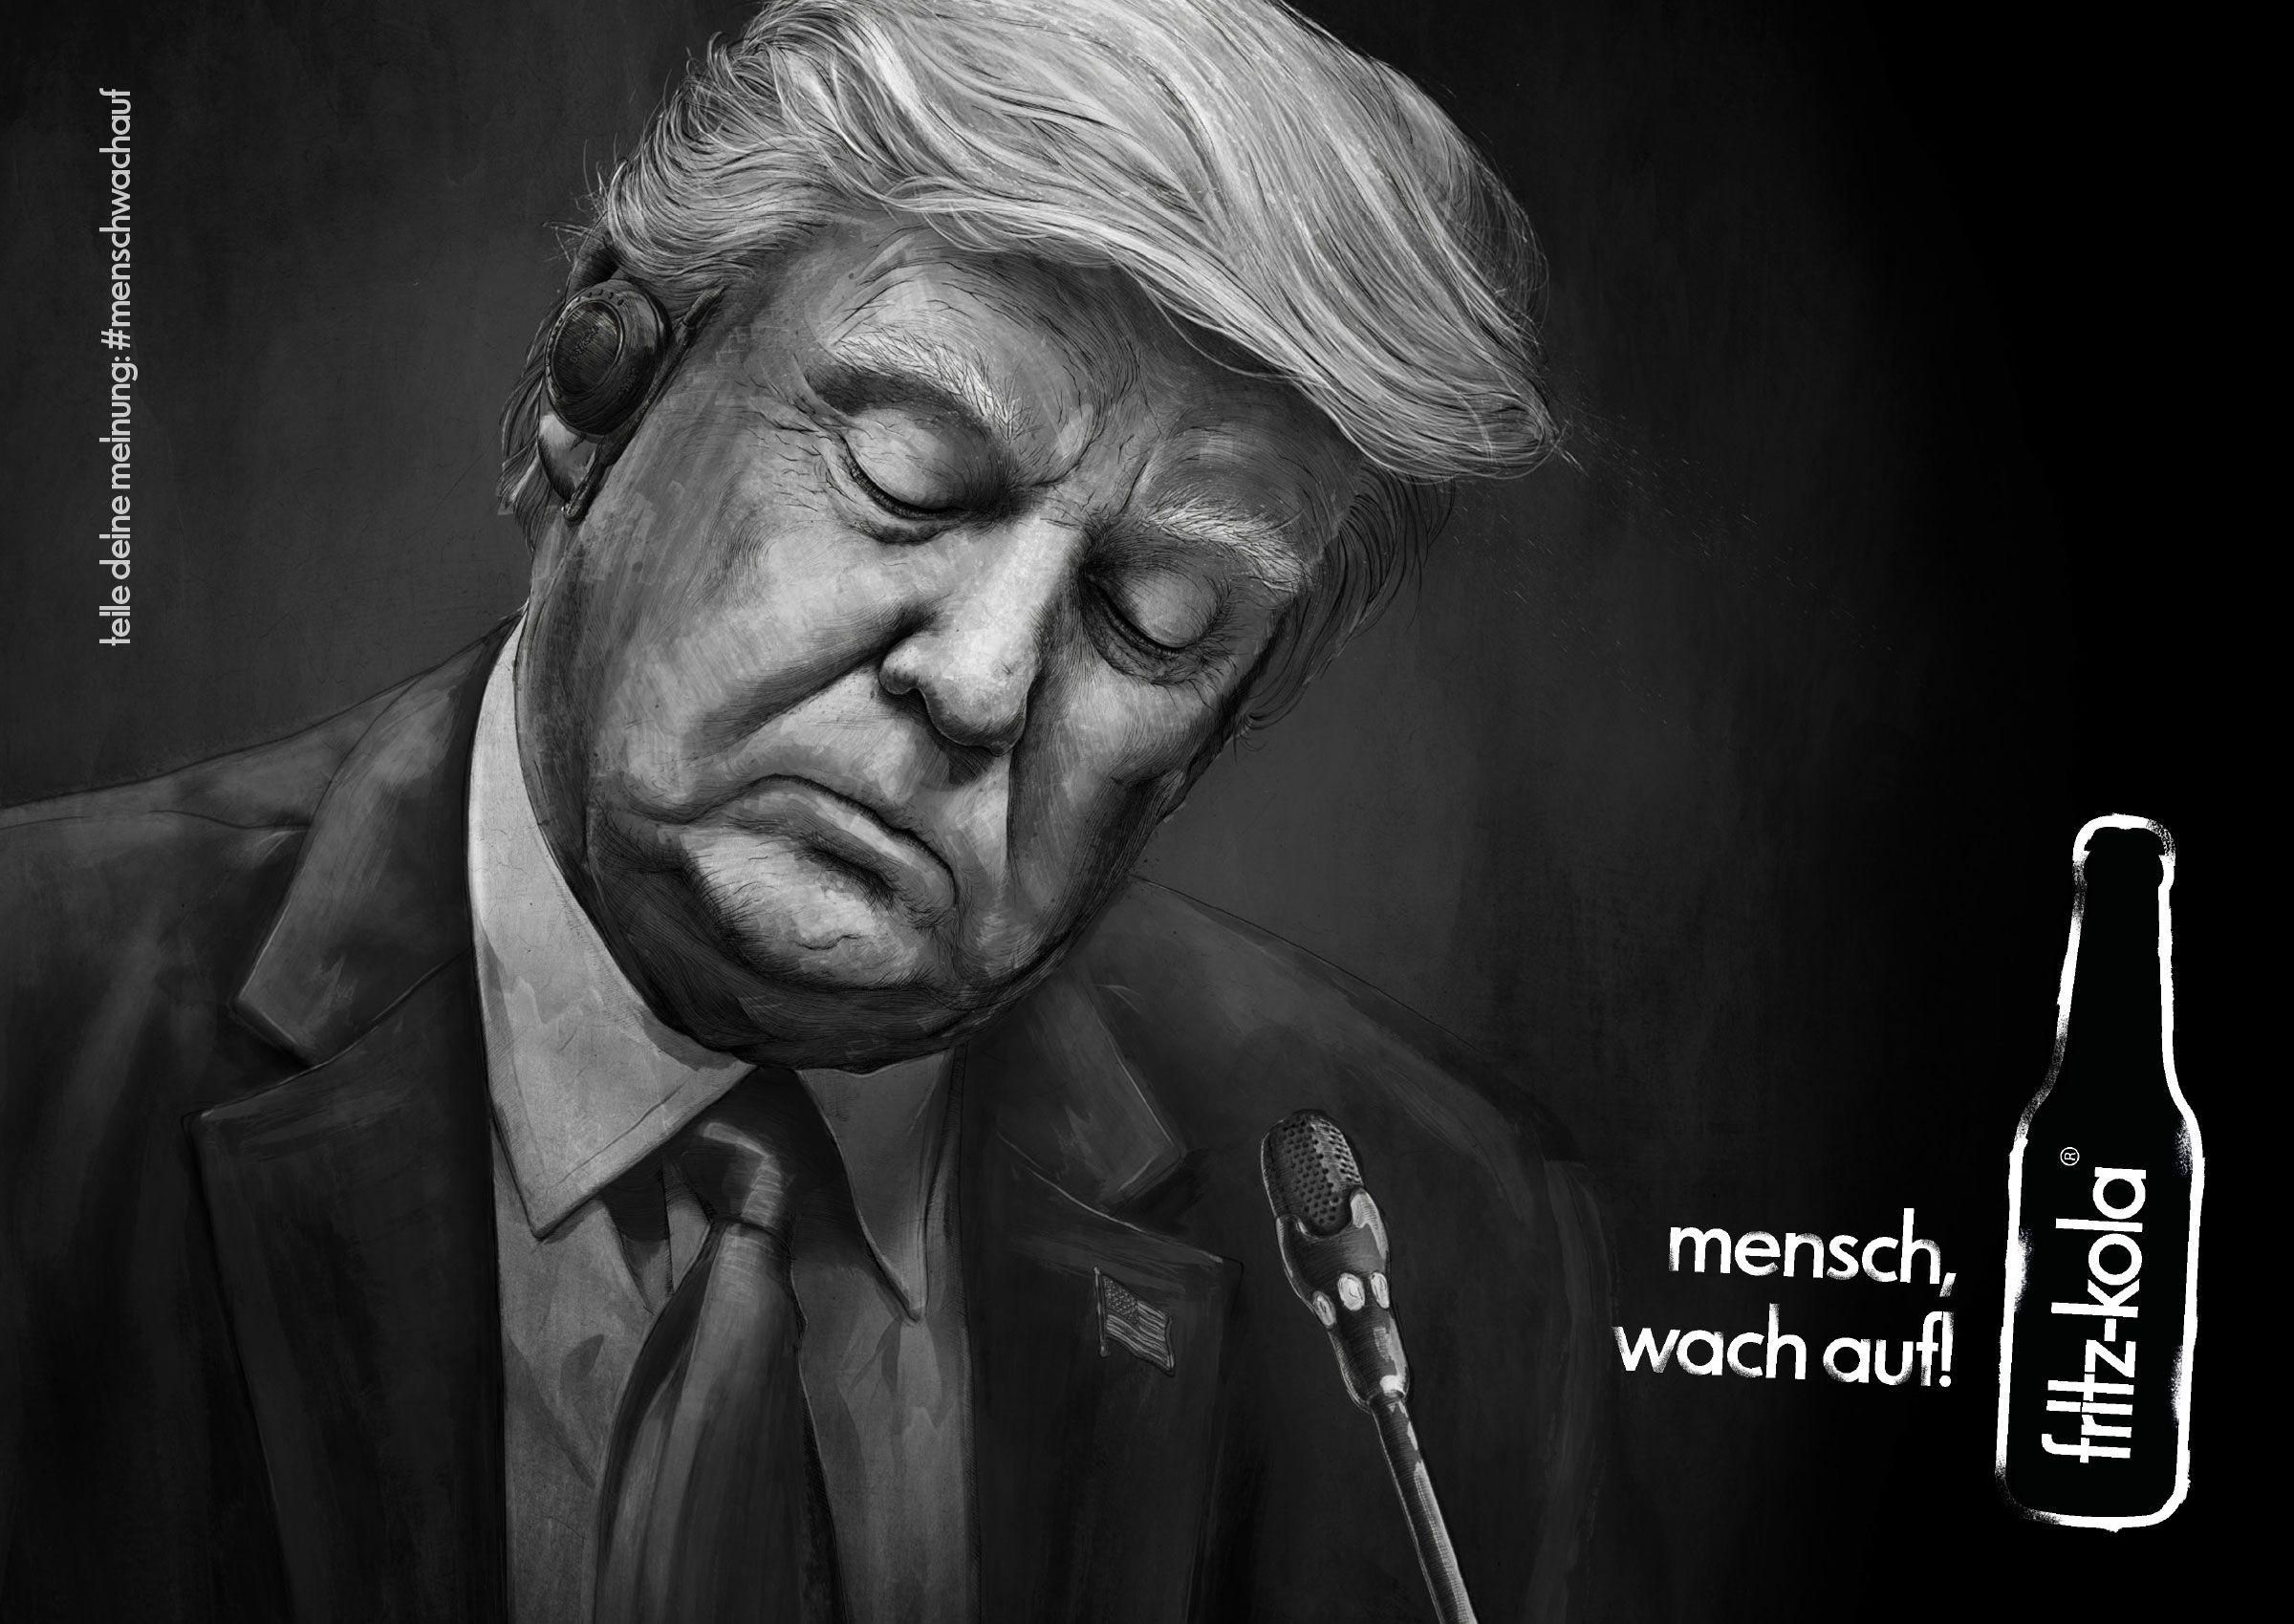 Fritz-kola: Wake up, man! - Trump   SiriusTraffic.com   Pinterest